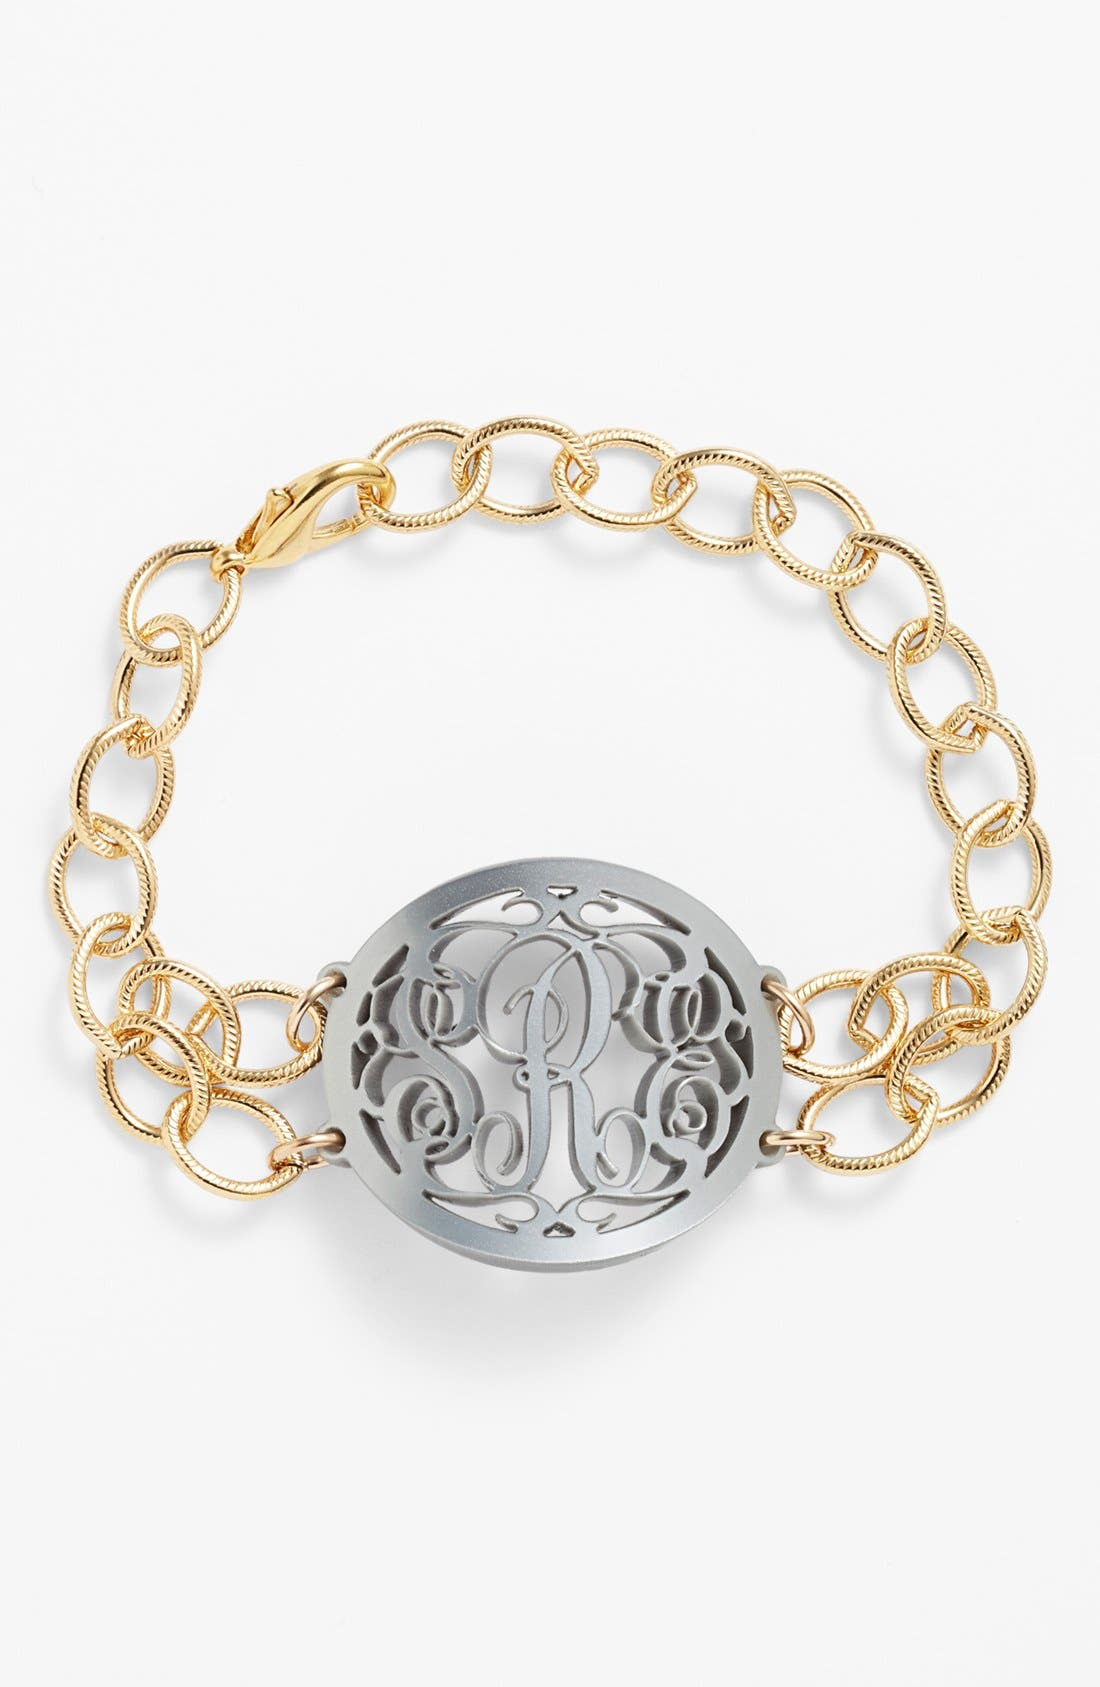 'Annabel' Medium Oval Personalized Monogram Bracelet,                         Main,                         color, GUNMETAL/ GOLD